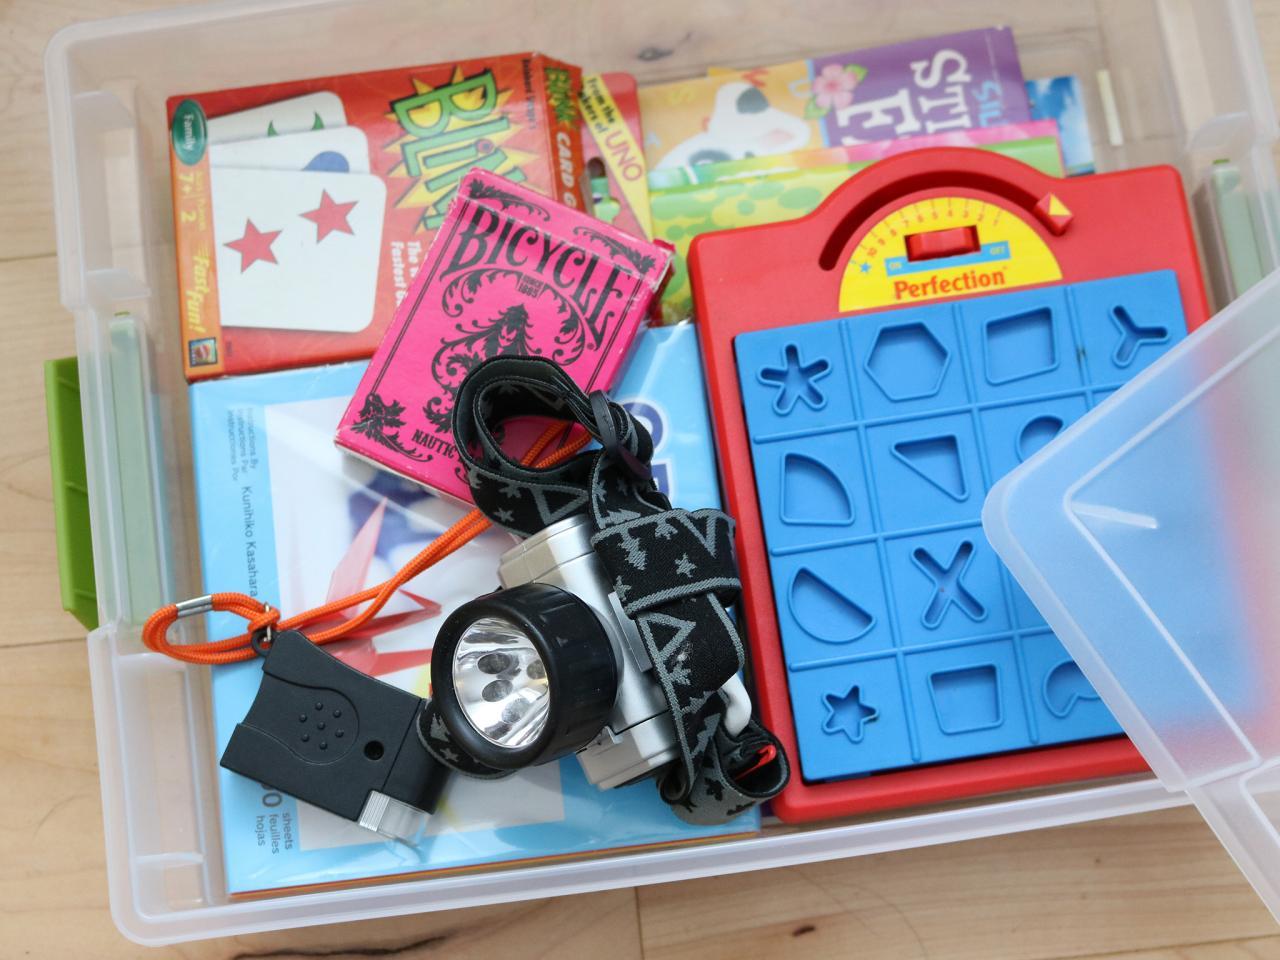 Toys For Travel : Make personal emergency kits hgtv